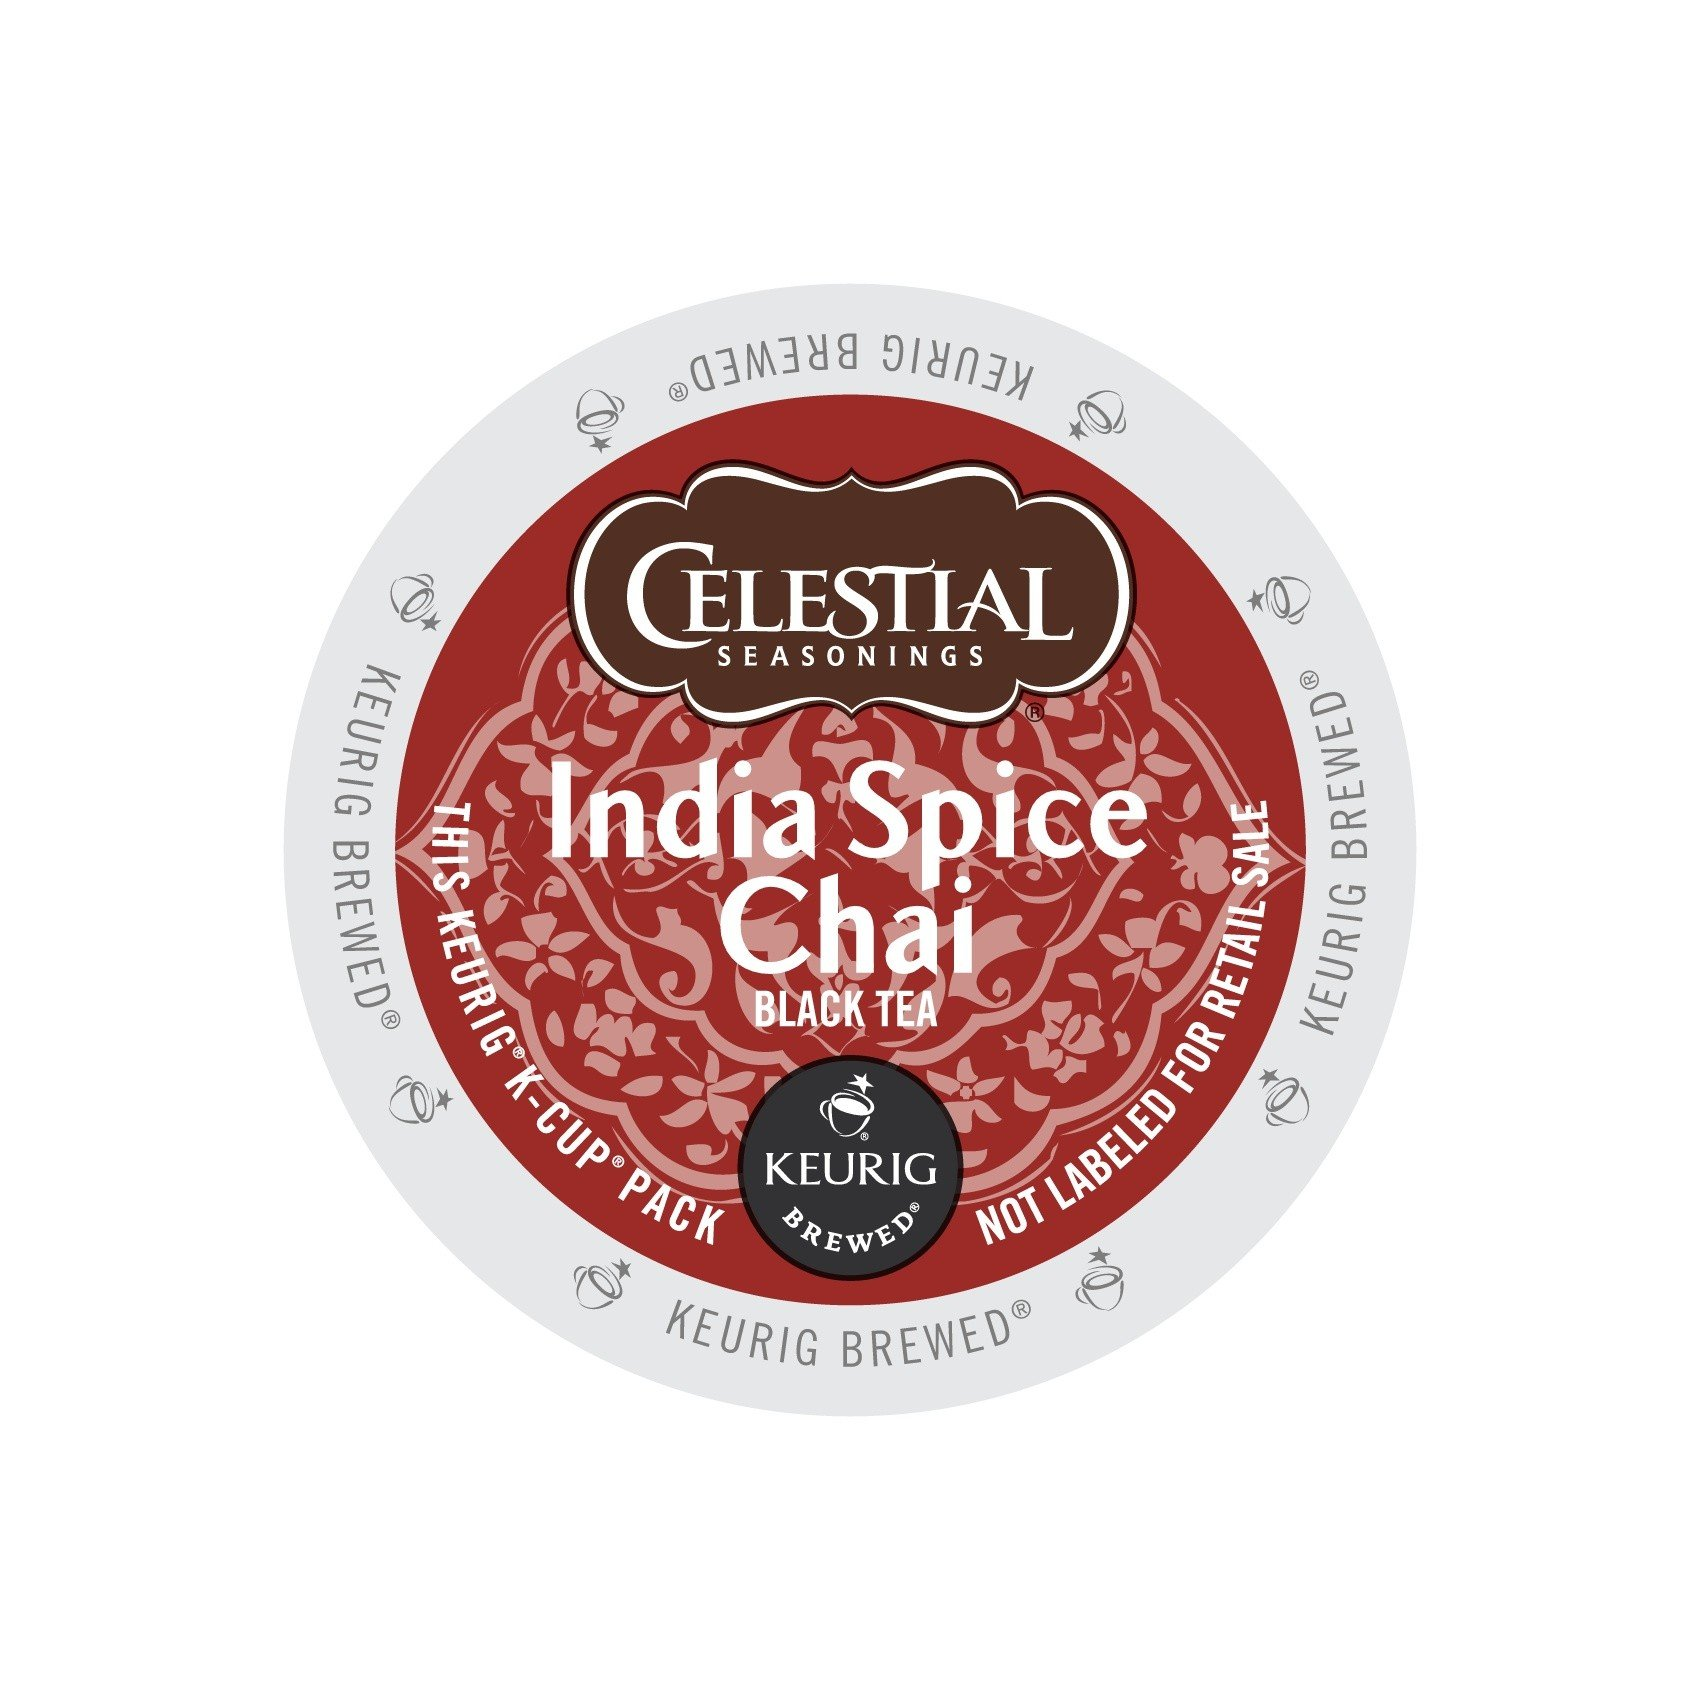 Celestial Seasonings India Spice Chai Tea K-Cup 48 Count Case by Celestial Seasonings